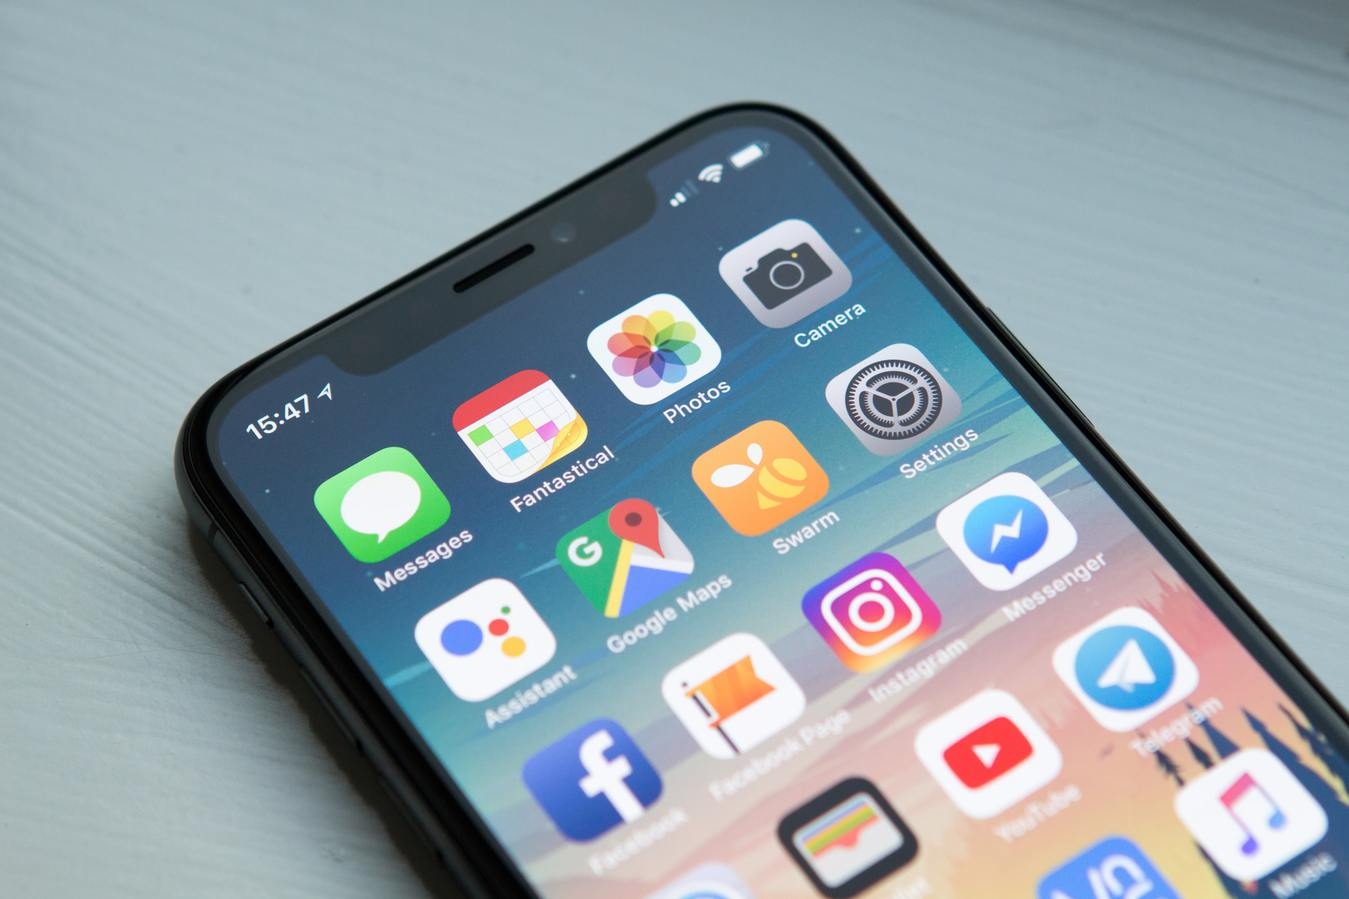 Schermo iPhone che mostra app